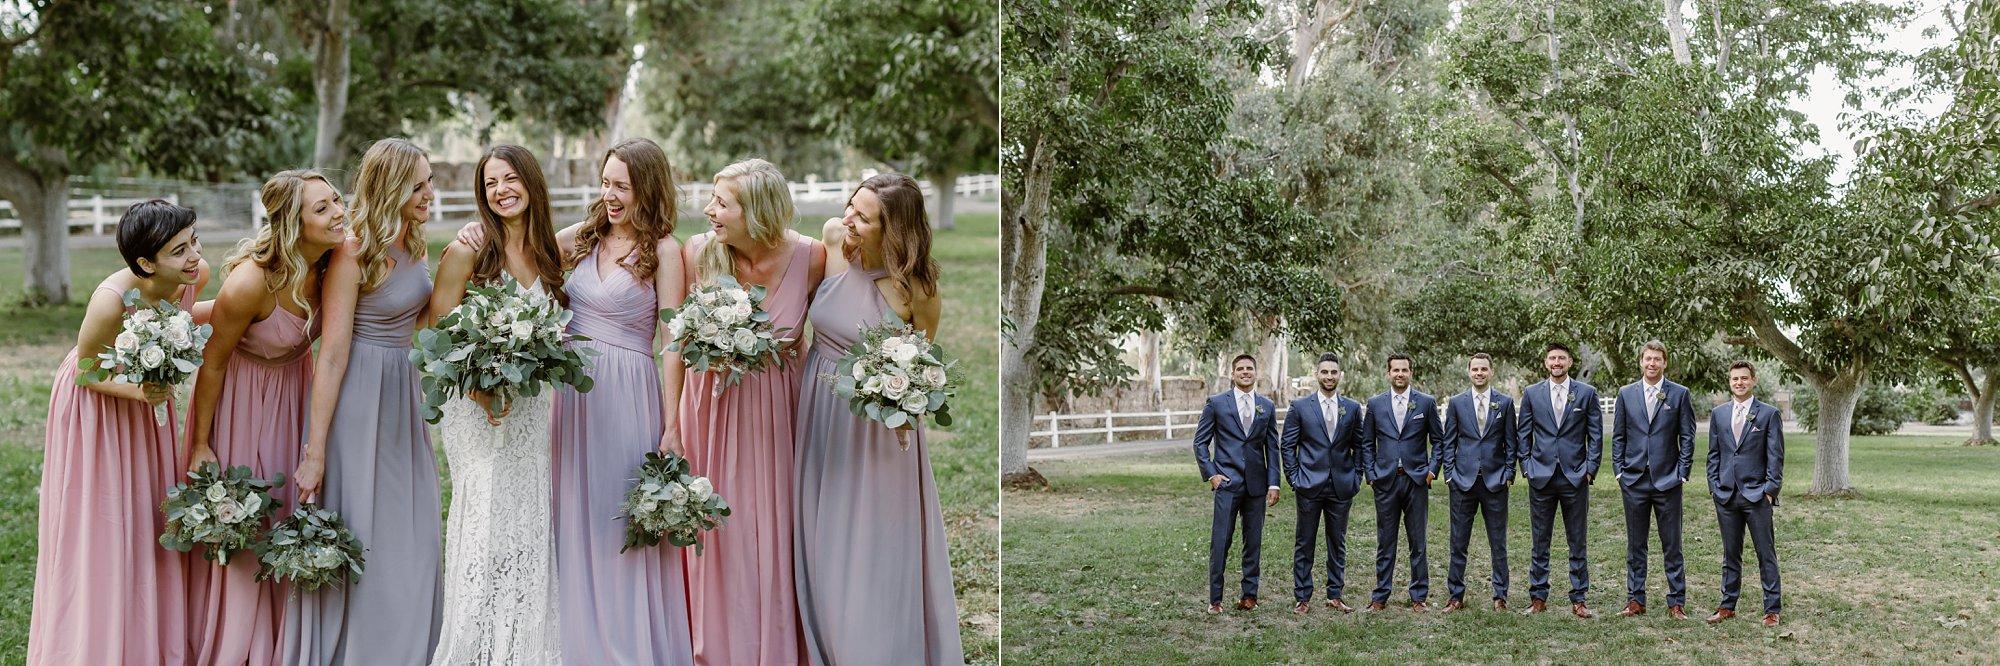 Walnut Grove Moorpark California Wedding_0049.jpg